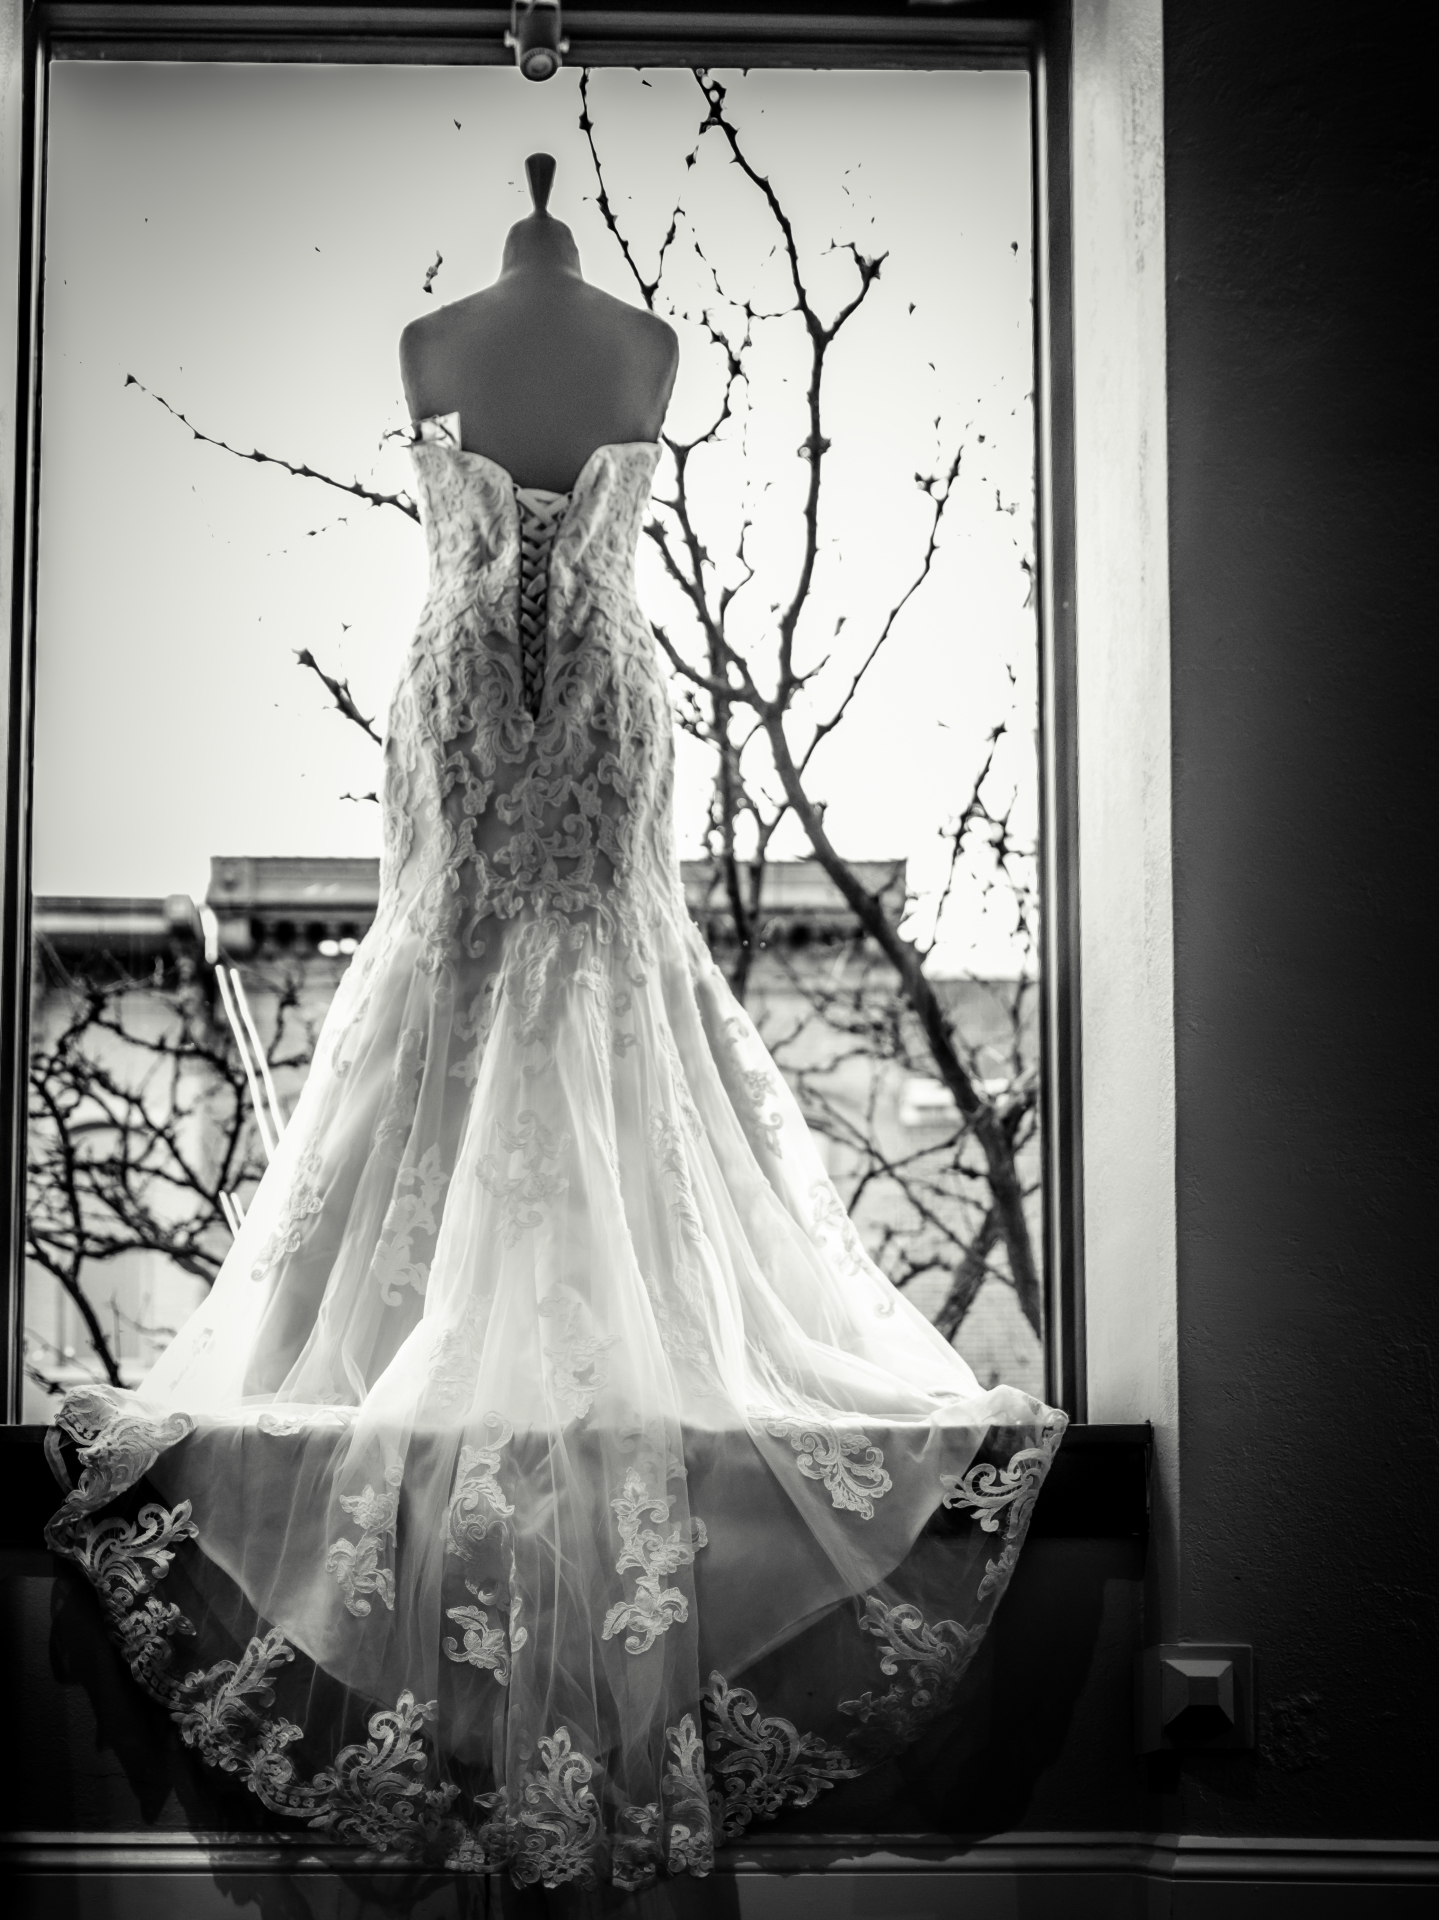 Wedding Photographer, Kalamazoo Michigan, Best photographer, best wedding photographer, wedding photographer in Kalamazoo Michigan, Detroit, Chicago Wedding Photographer,